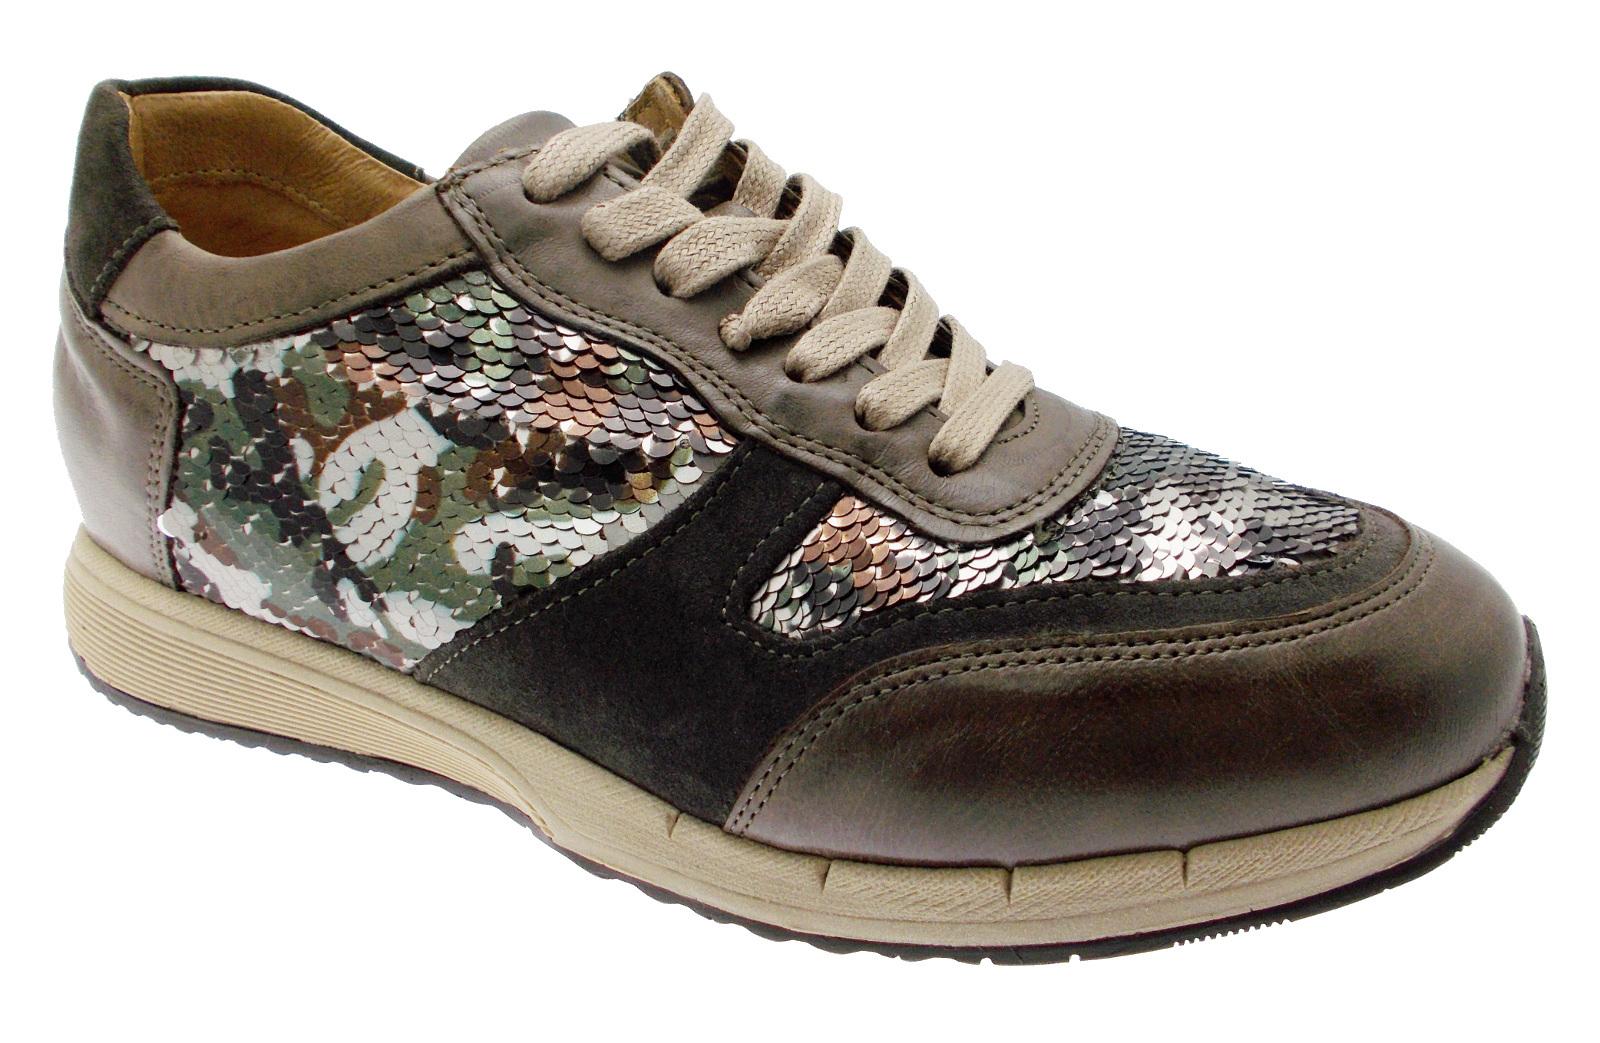 Article C3717 orthopedic shoe woman taupe military sneaker loren